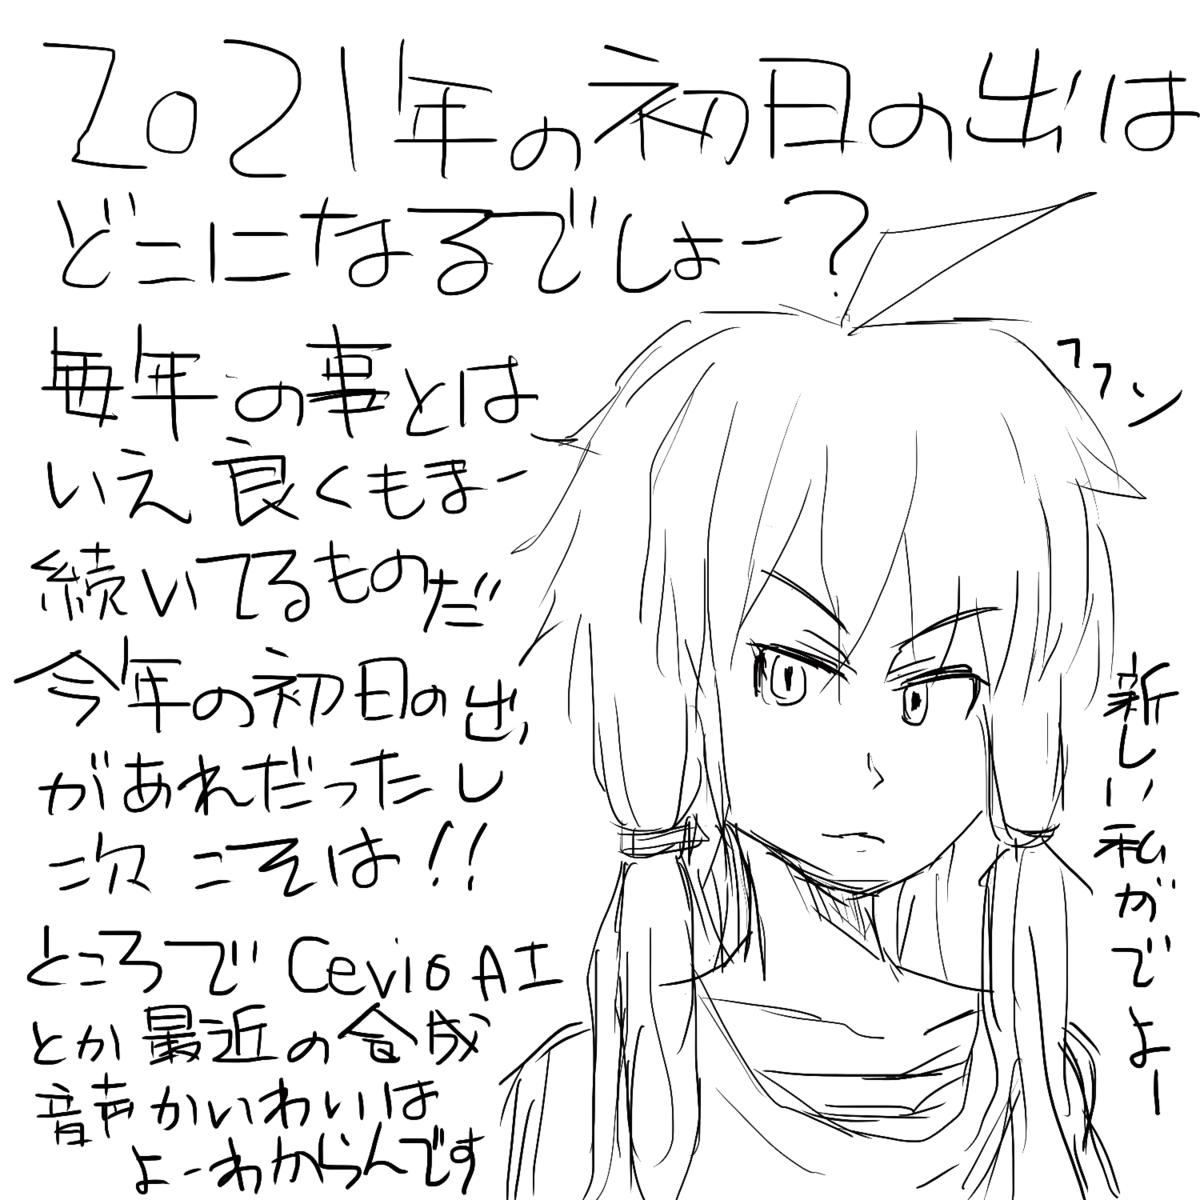 f:id:zomuzomu:20201120222615p:plain